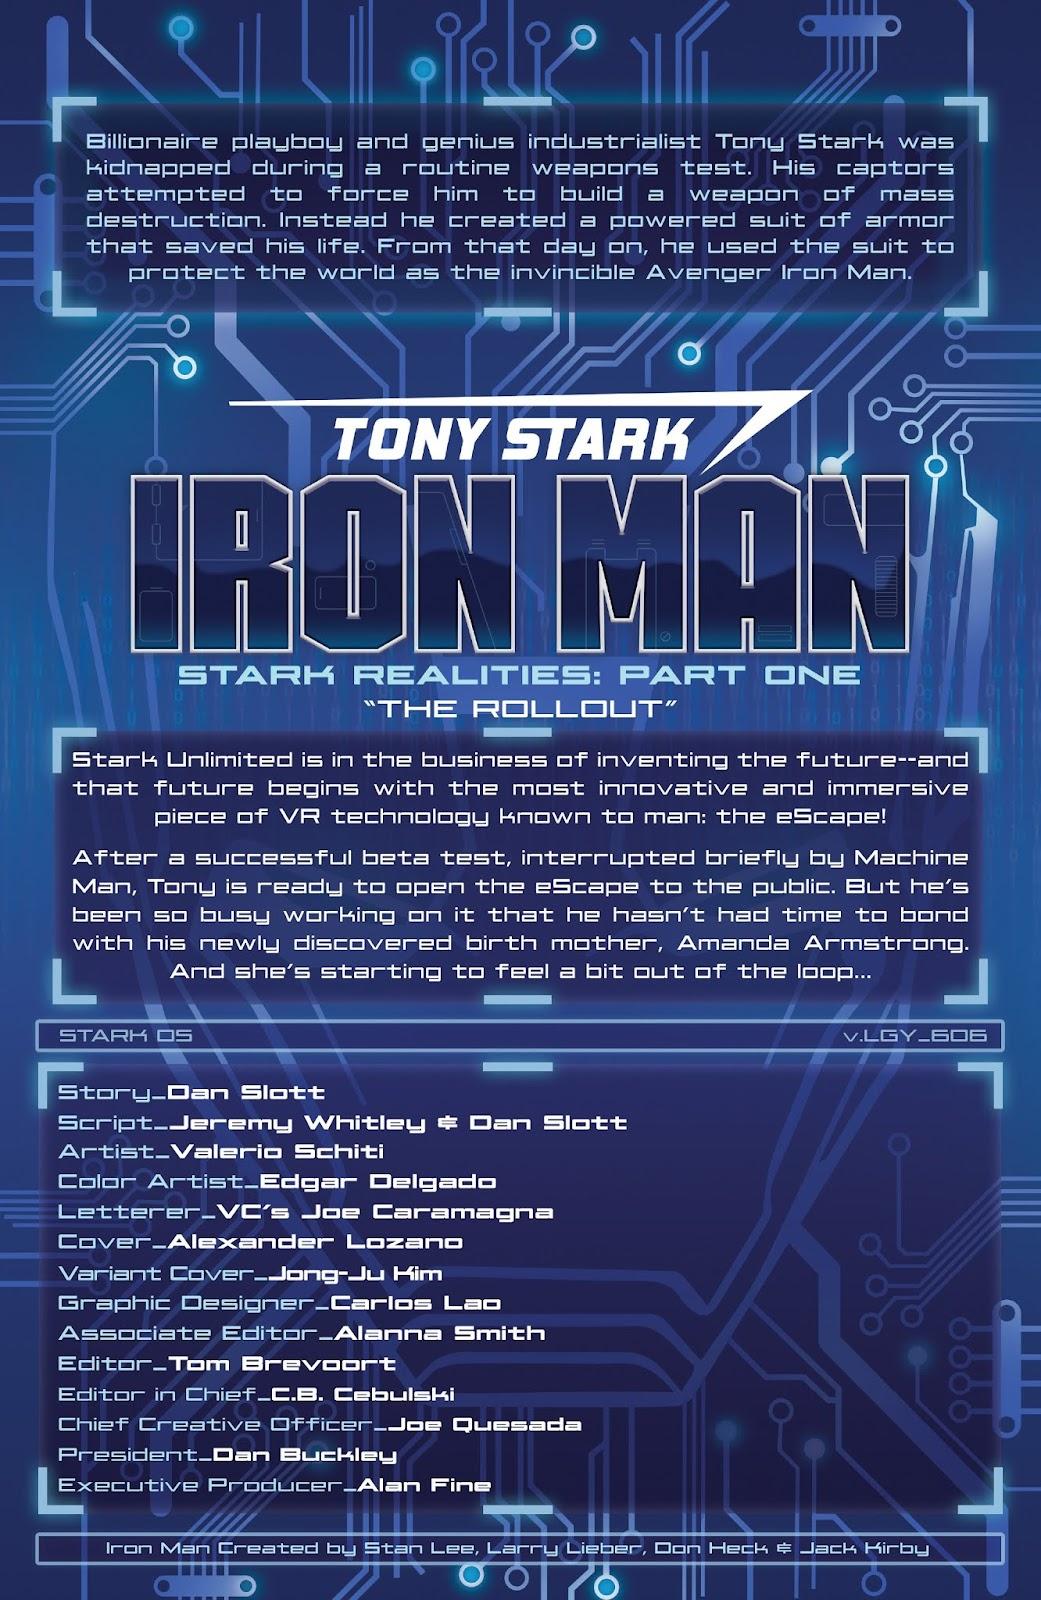 Read online Tony Stark: Iron Man comic -  Issue #6 - 2